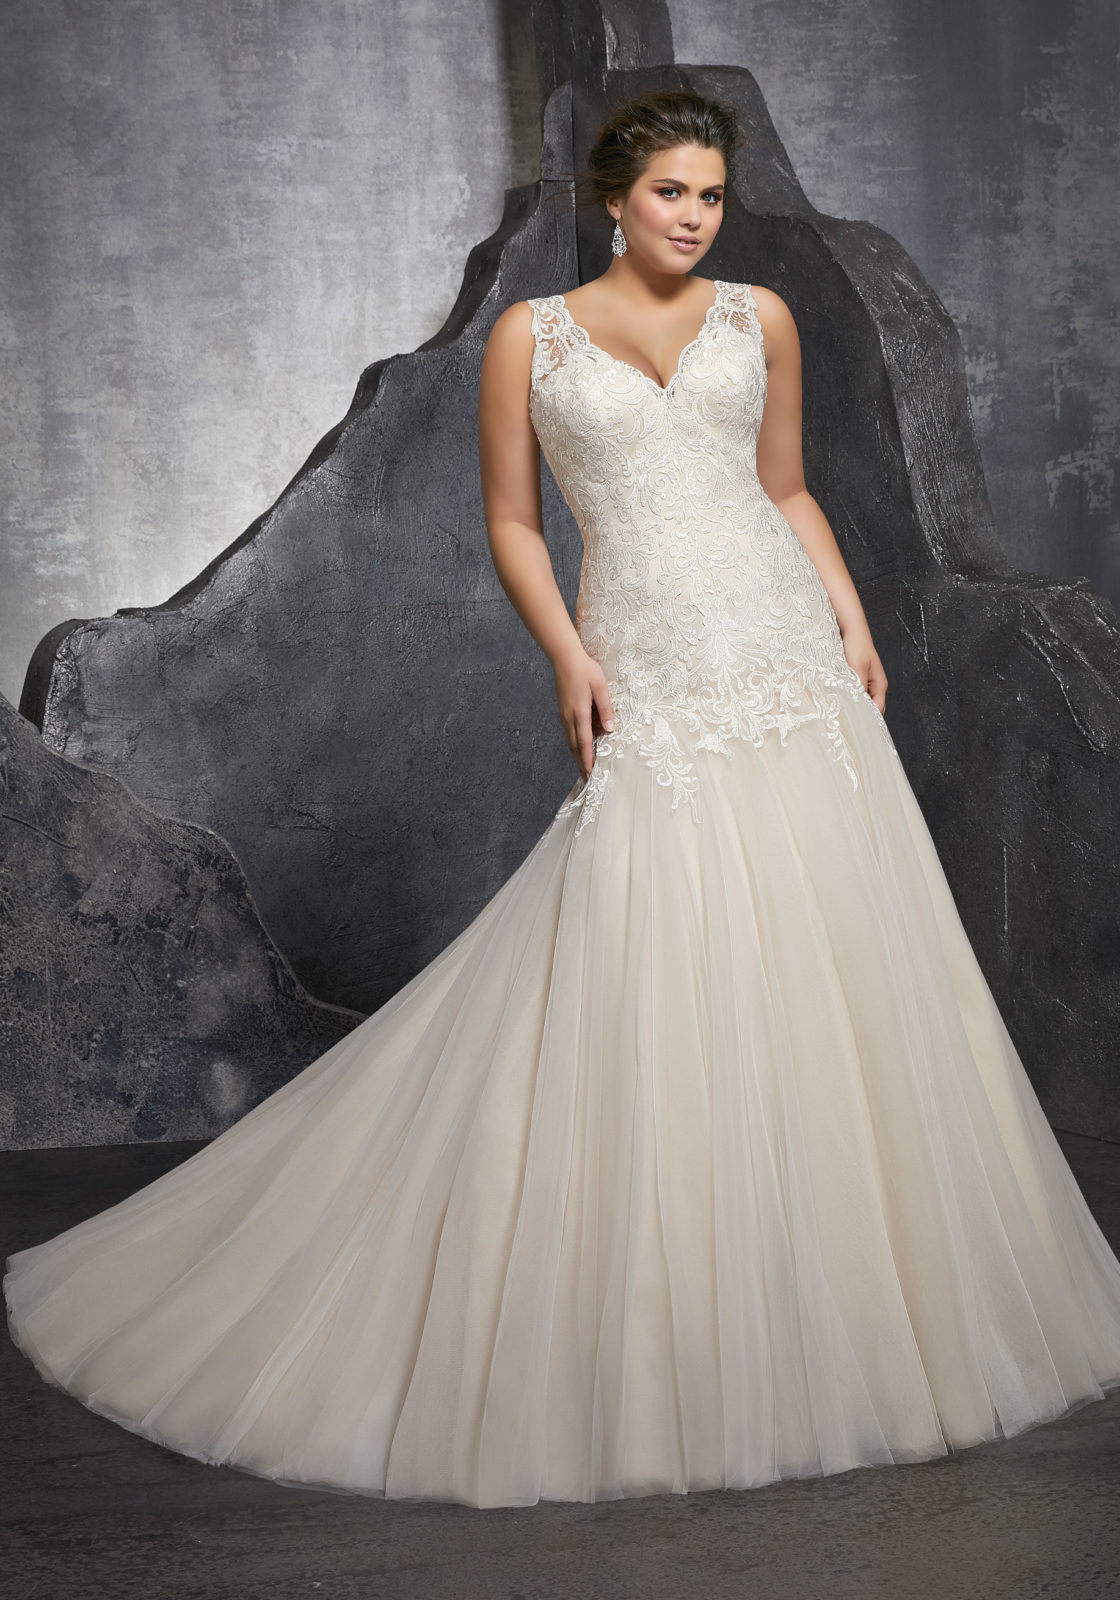 [Hot Item] Sleeveless Bridal Gowns Plus Size Mermaid Wedding Dress Lb3236